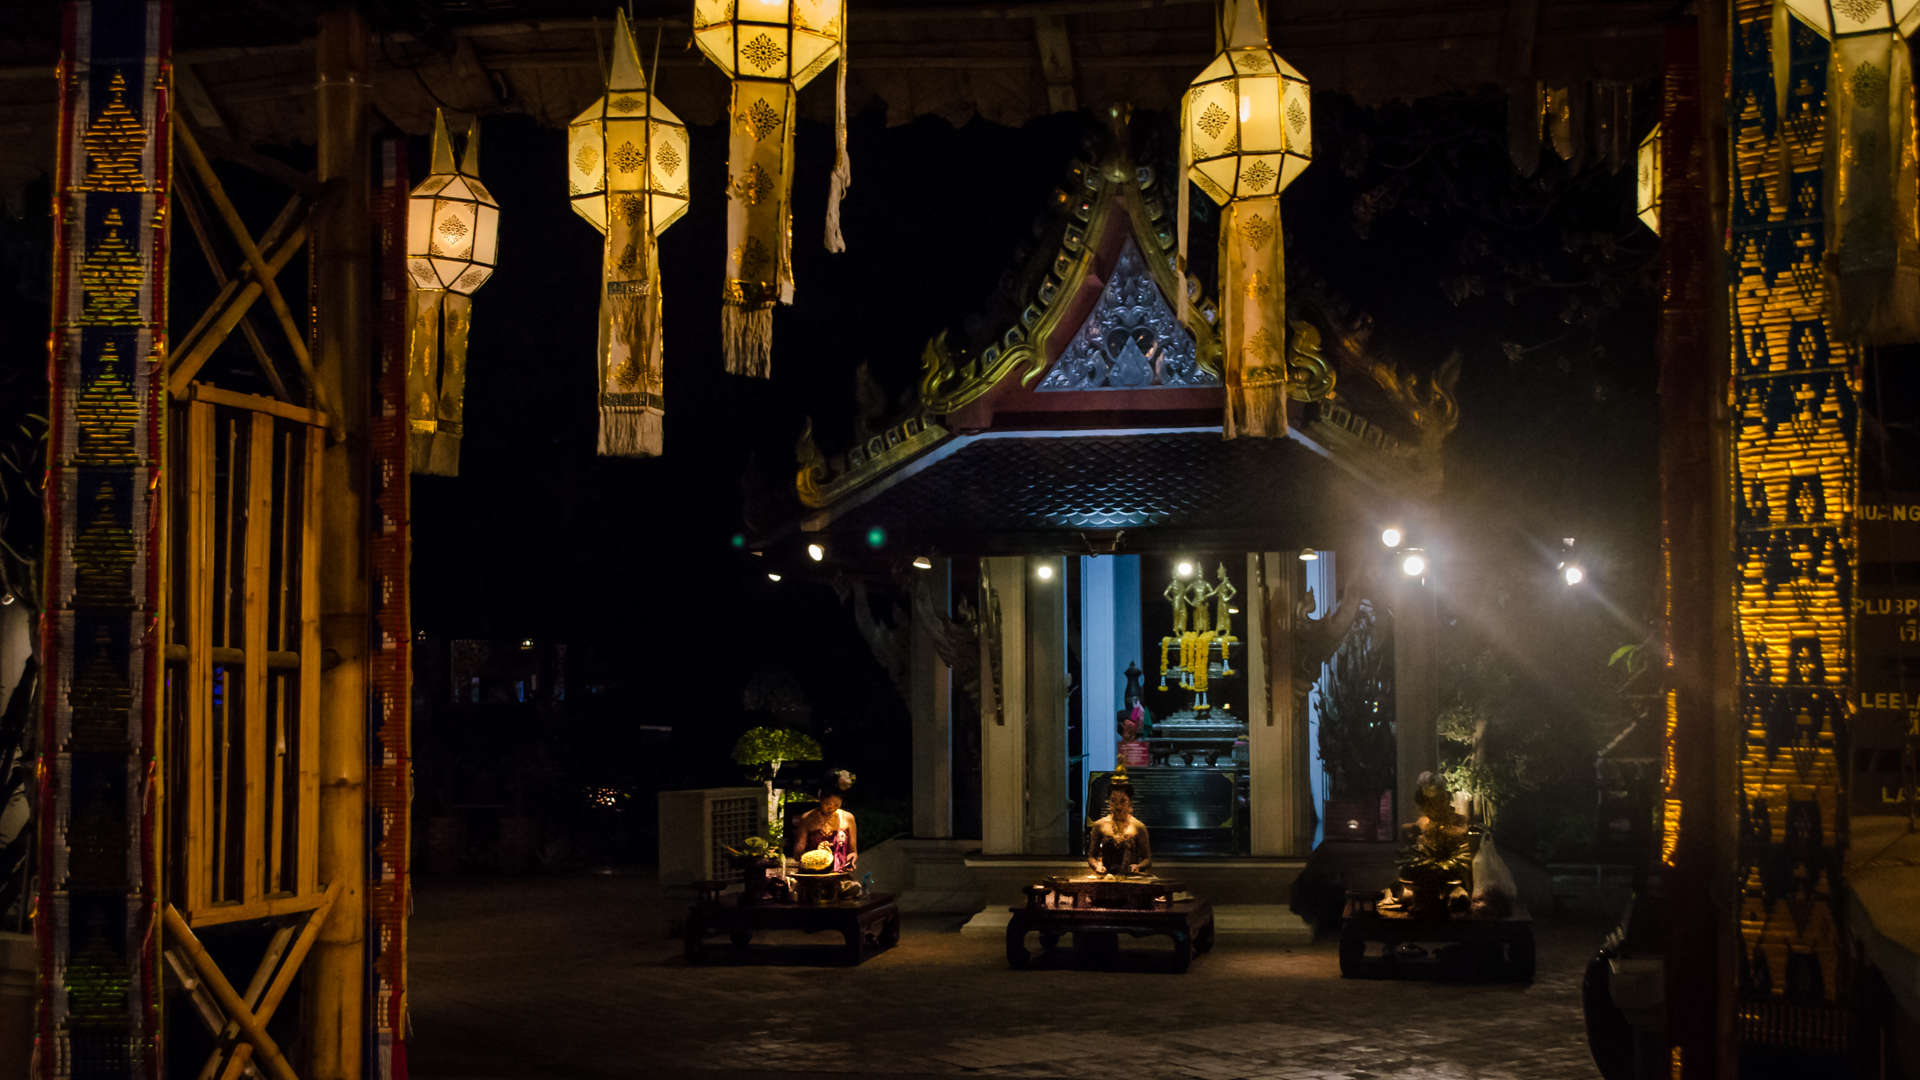 thailand, thailand temple, thailand buddhism, buddhist temple thailand, chiangmai, chiang mai, chiang mai thailand, night temple thailand, night thailand, night meditation, meditation thai temple